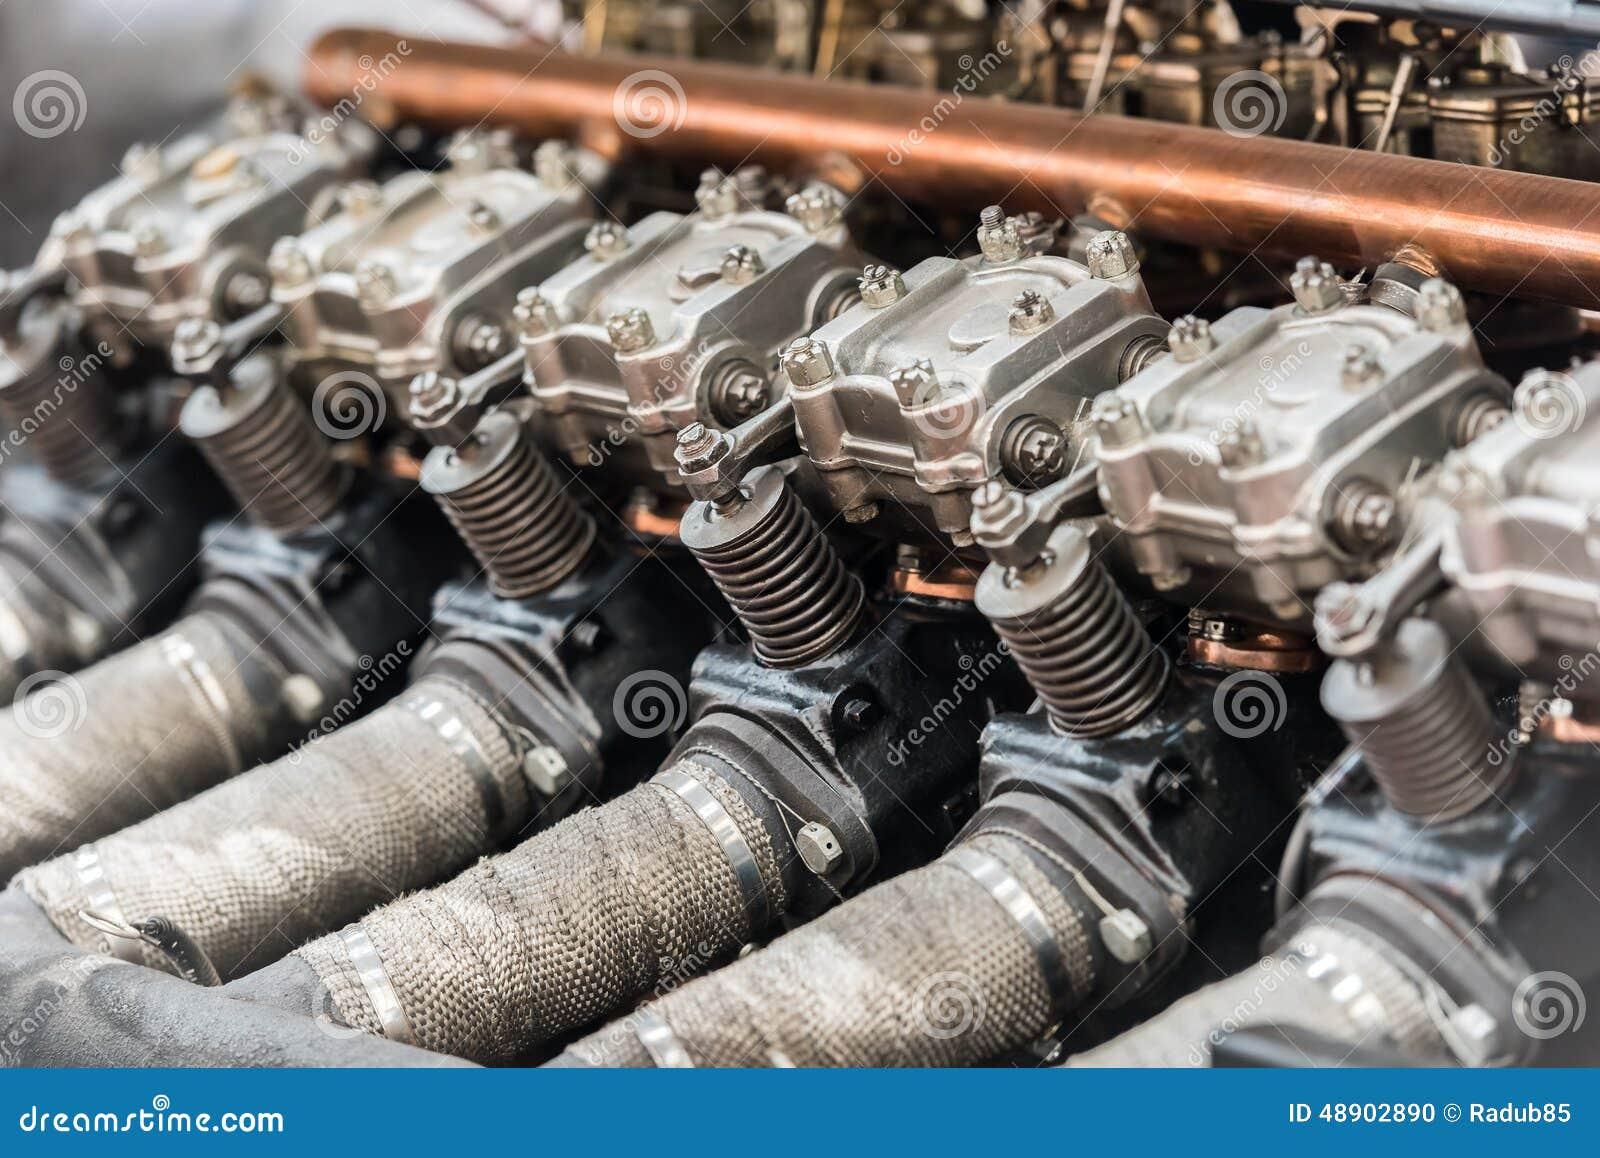 piston in car engine - photo #31